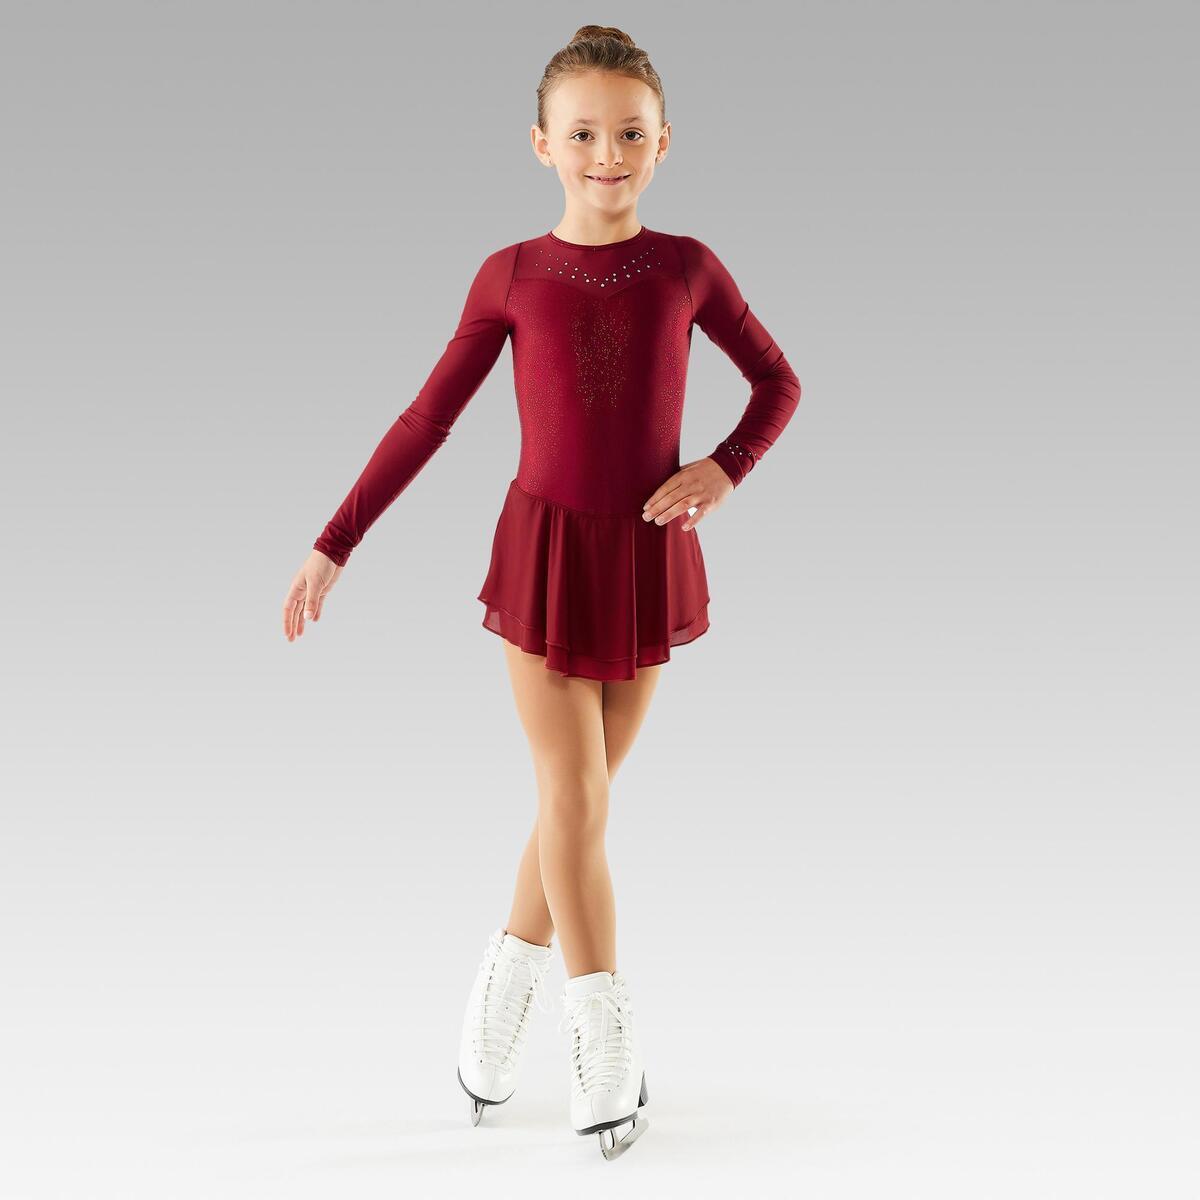 Bild 3 von Eiskunstlaufkleid langarm Kinder bordeaux